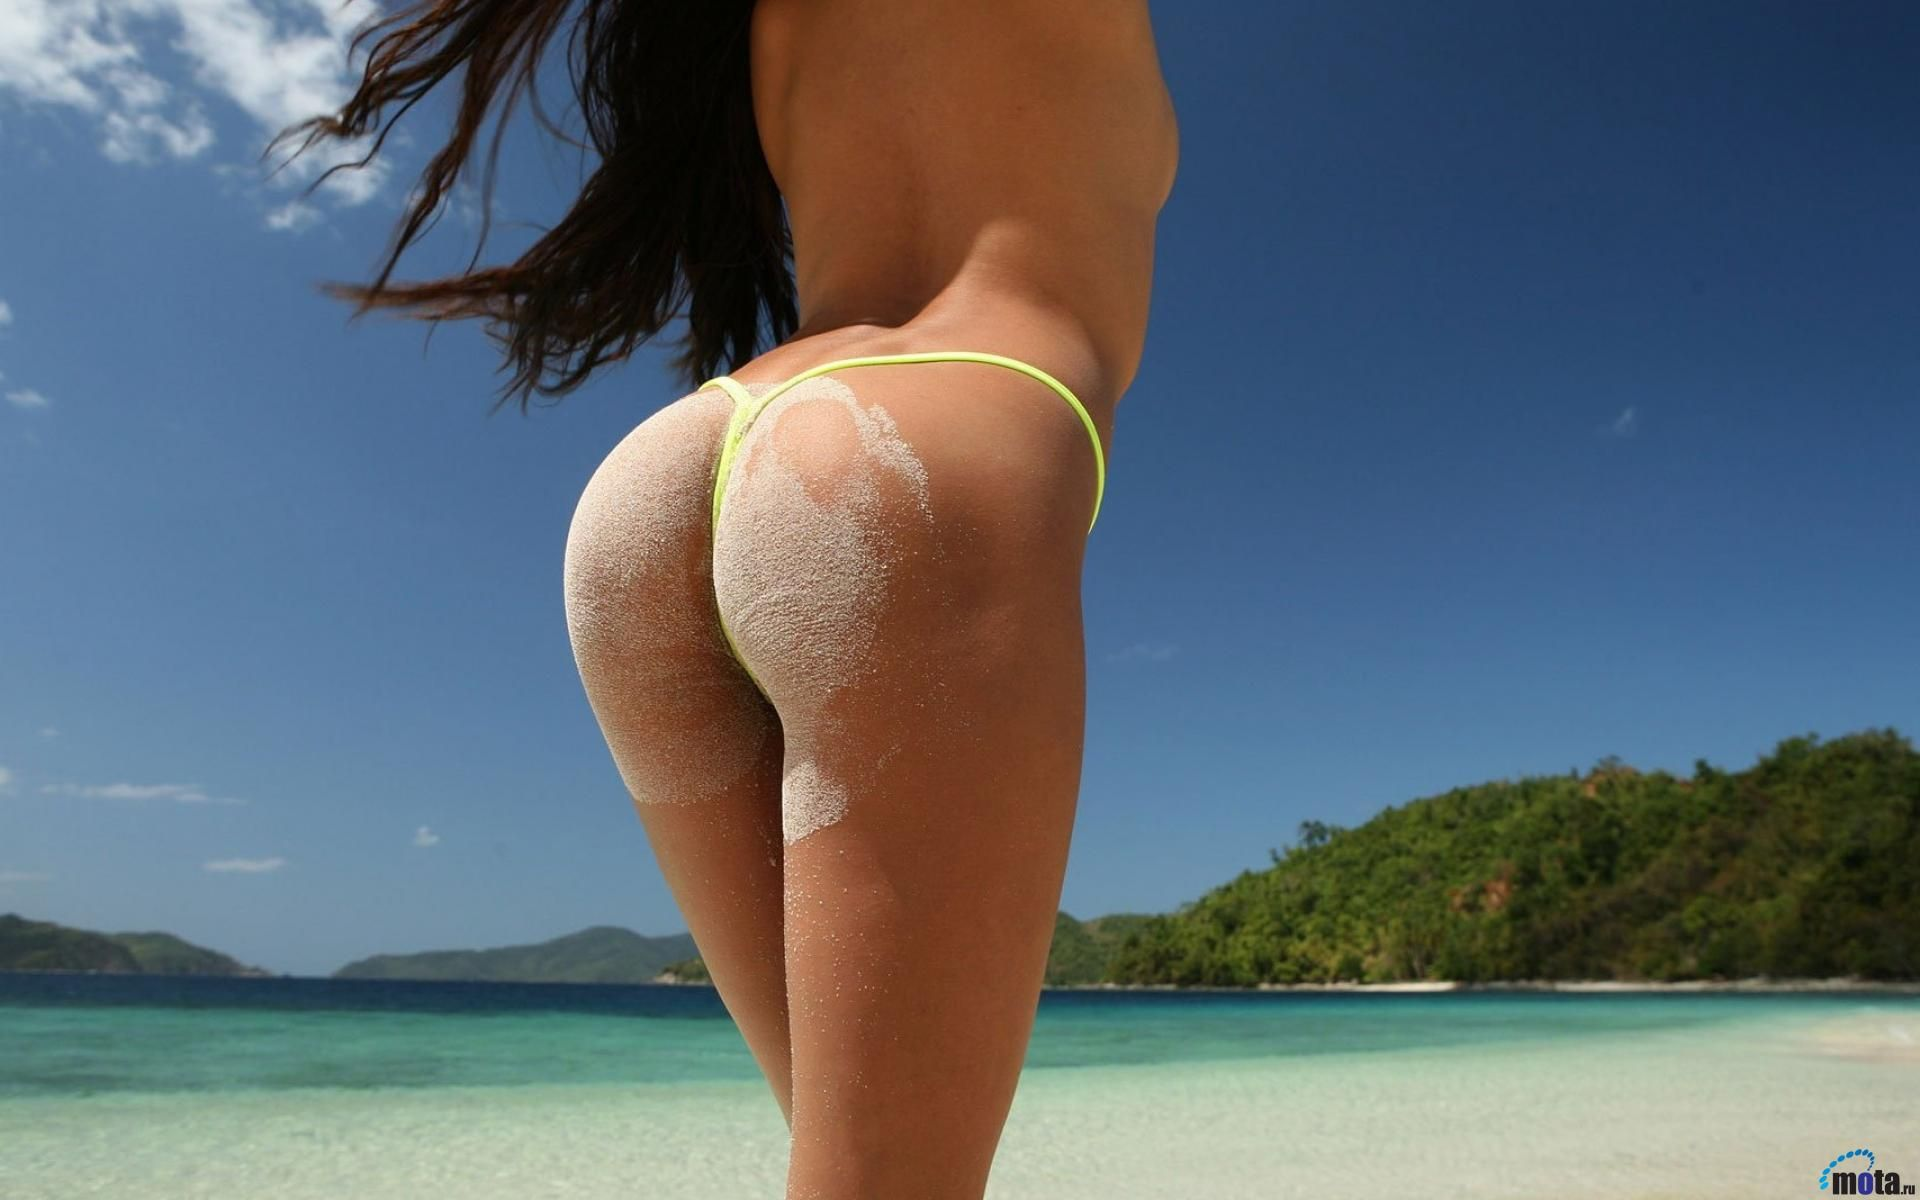 Pretty ass pics #4